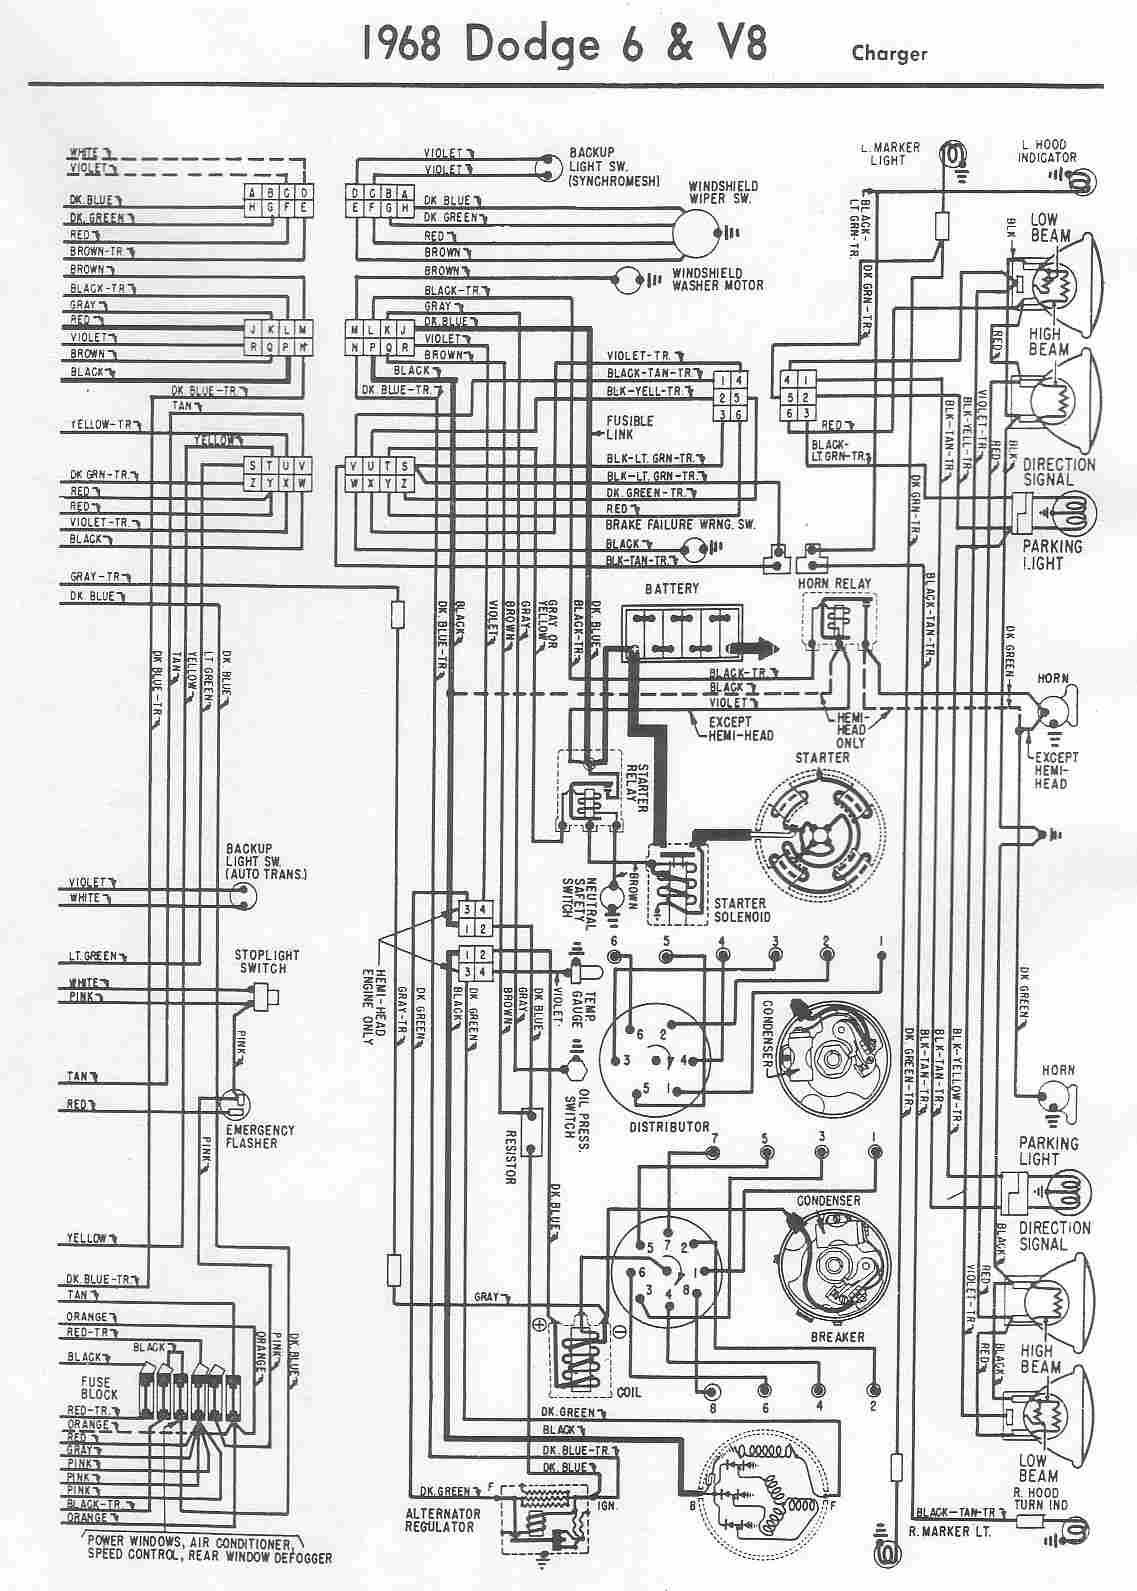 1968 V8 Engine Diagram La115 Wiring Diagram Bege Wiring Diagram